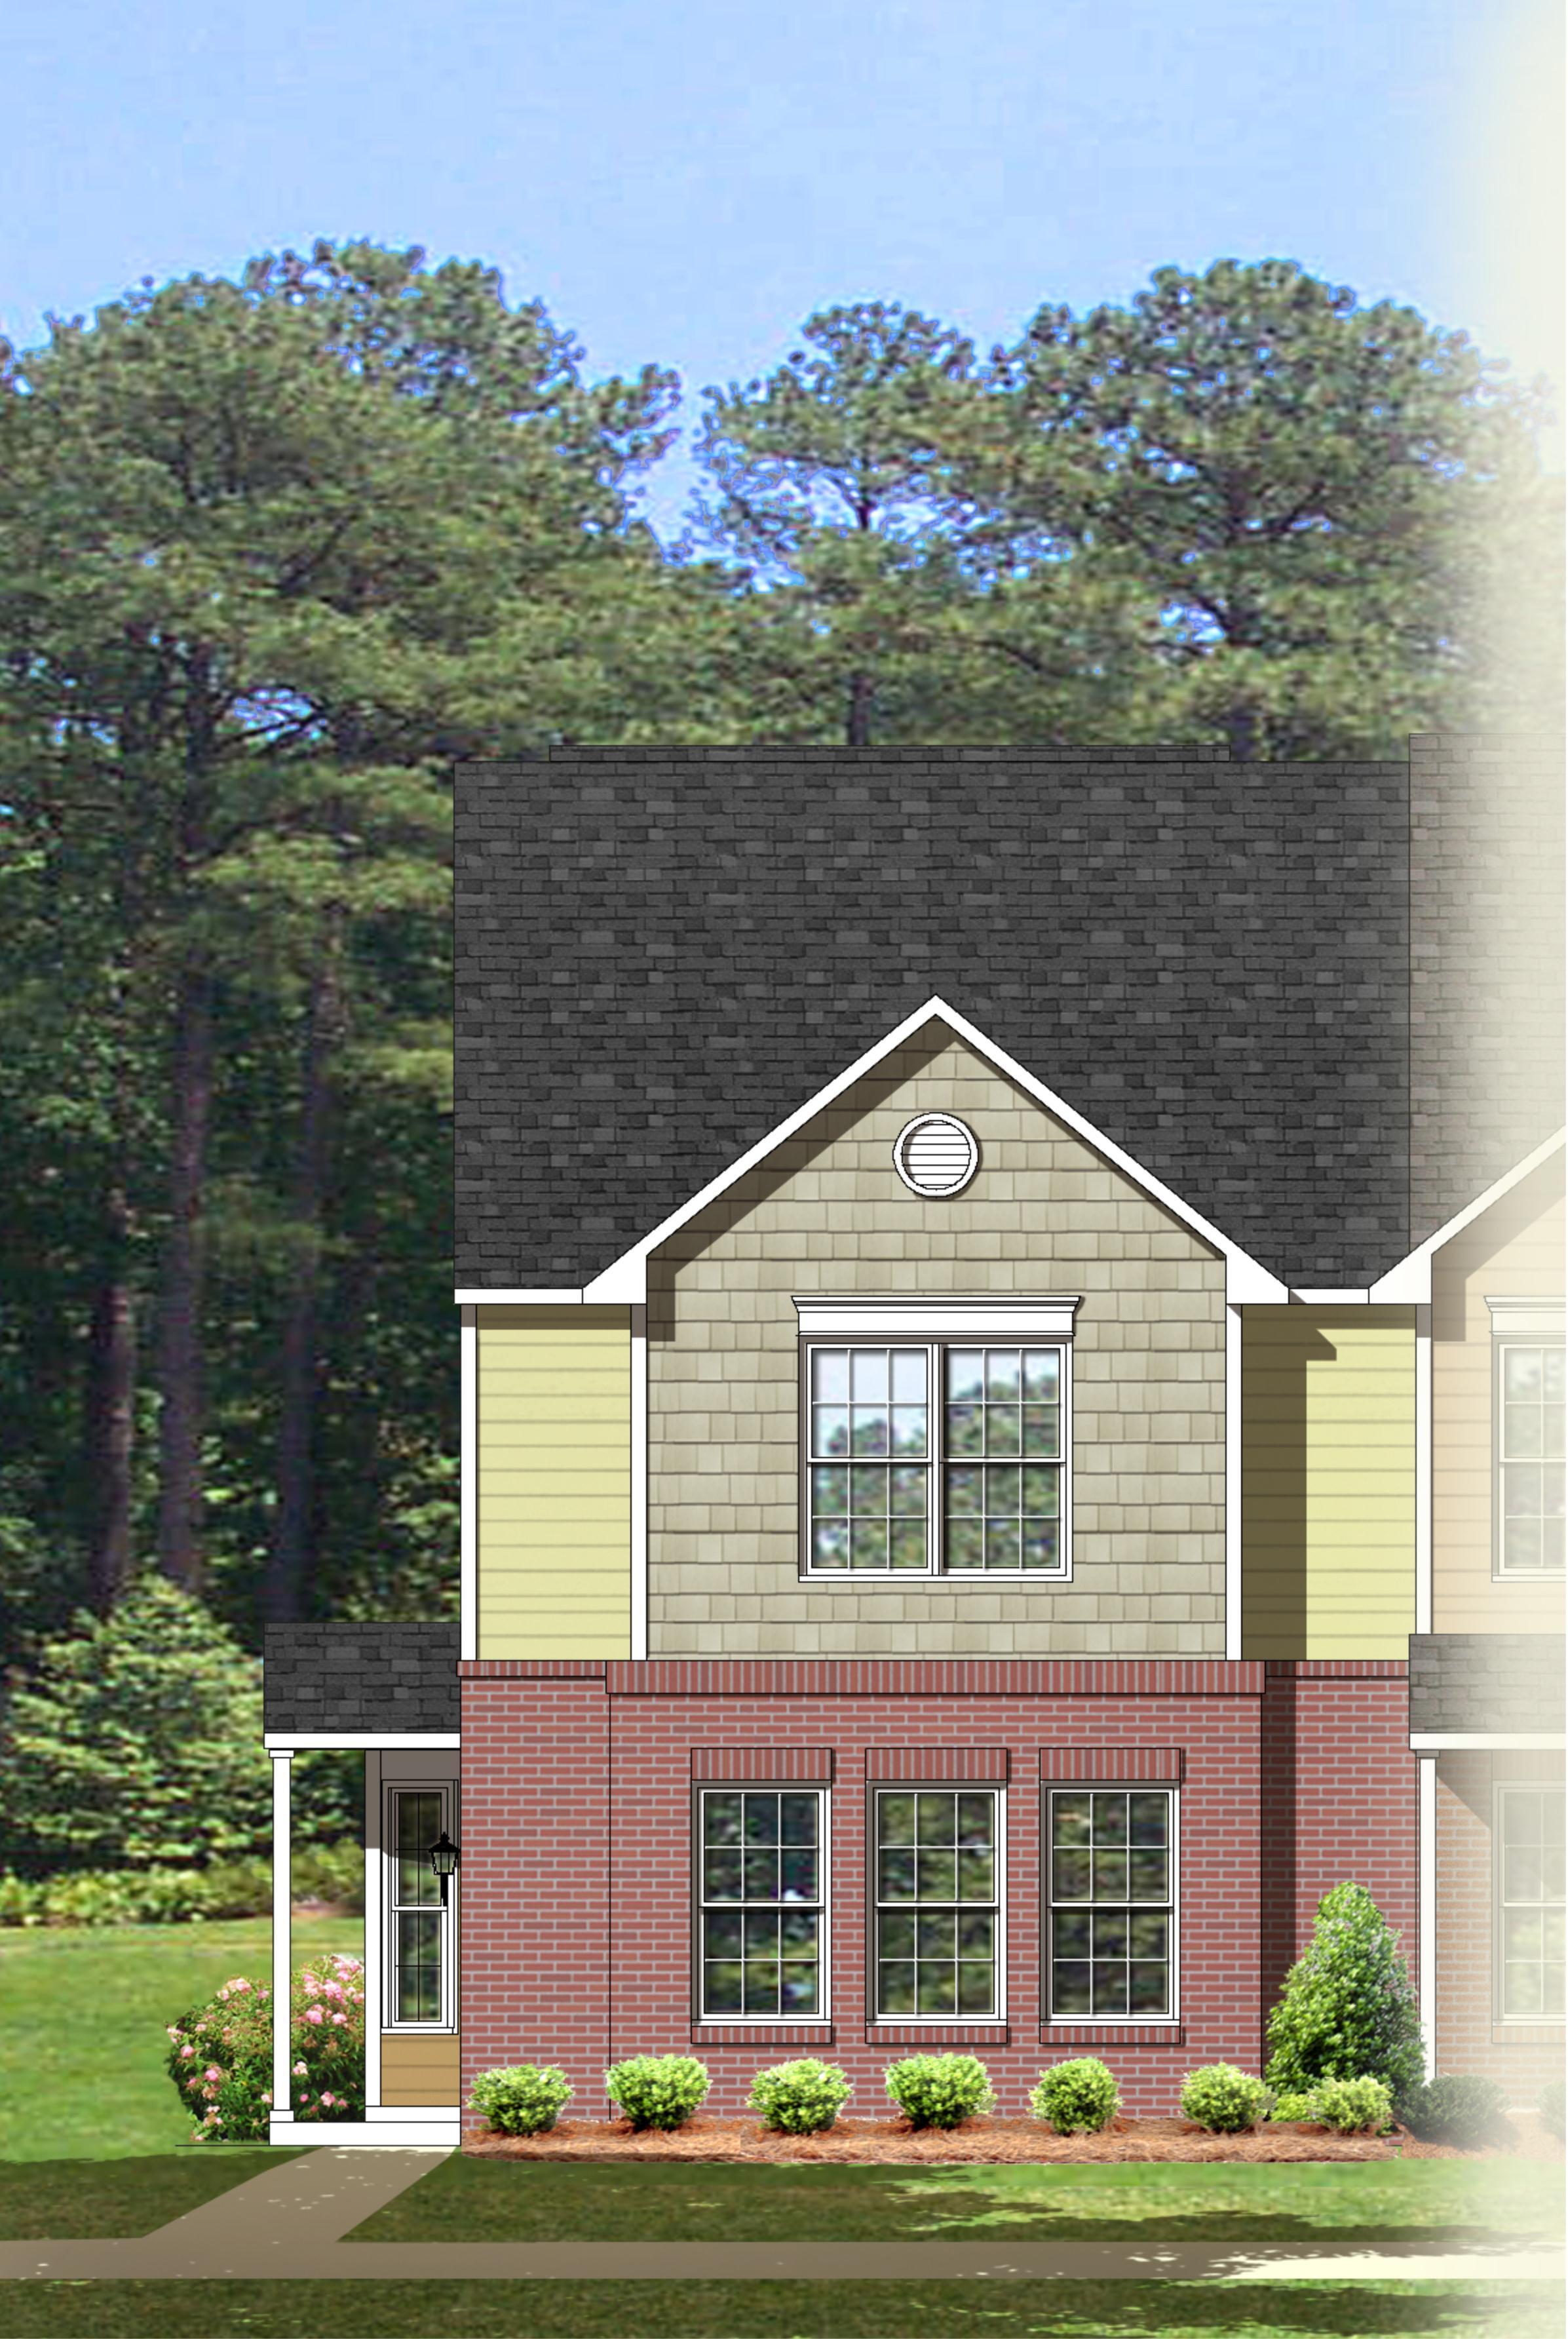 New Homes in Haymount, NC | 60 Communities | NewHomeSource